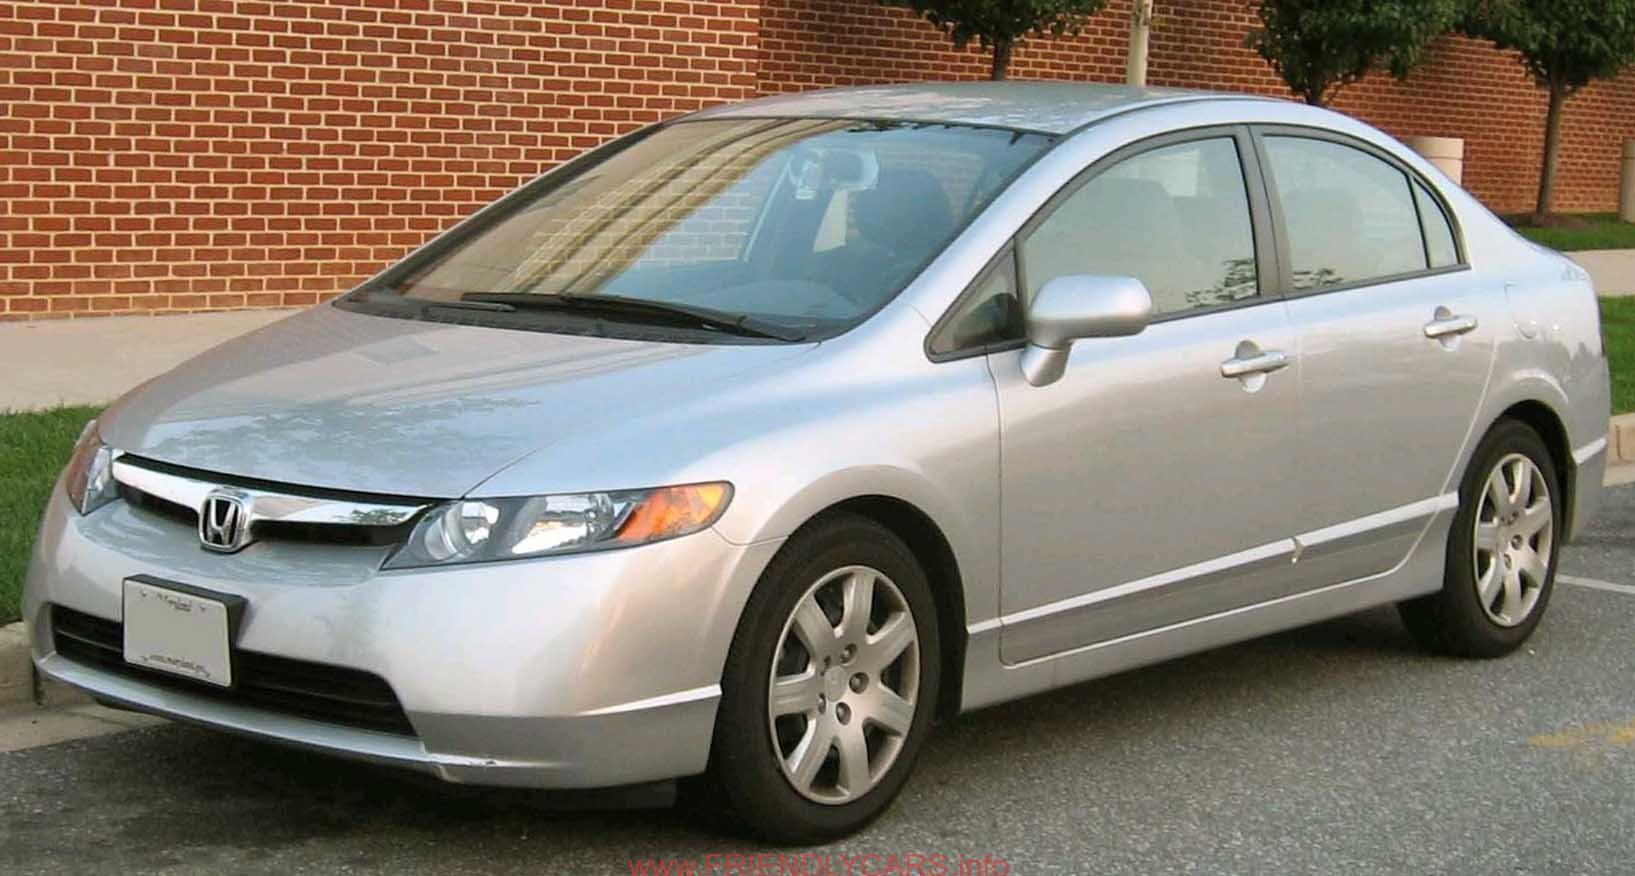 awesome honda civic 2003 modified car images hd Honda Civic Wikipedia the  free encyclopedia